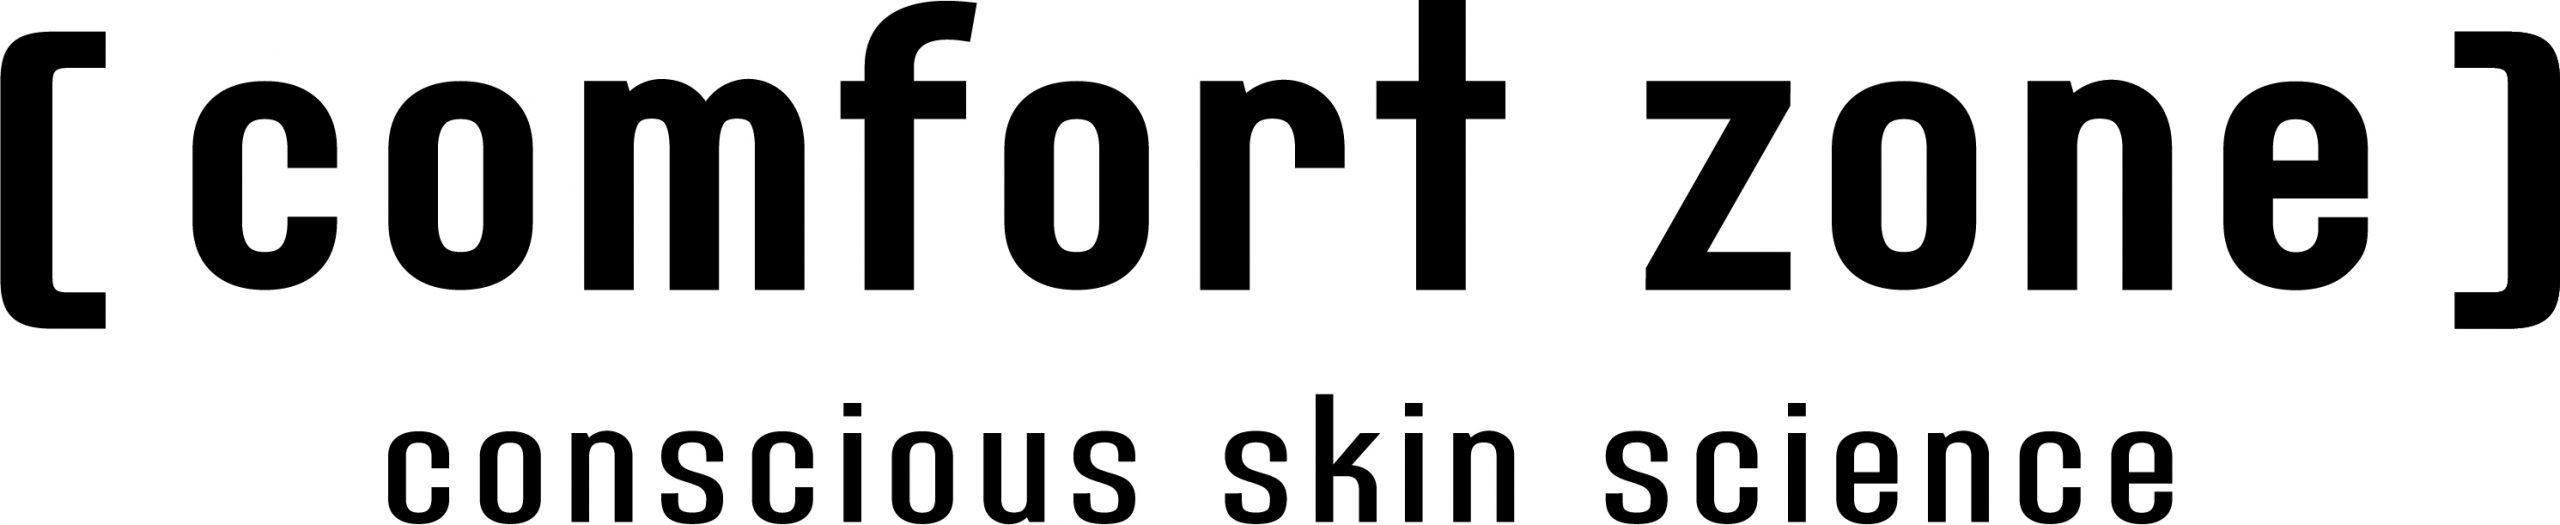 risorsa 1cz logo